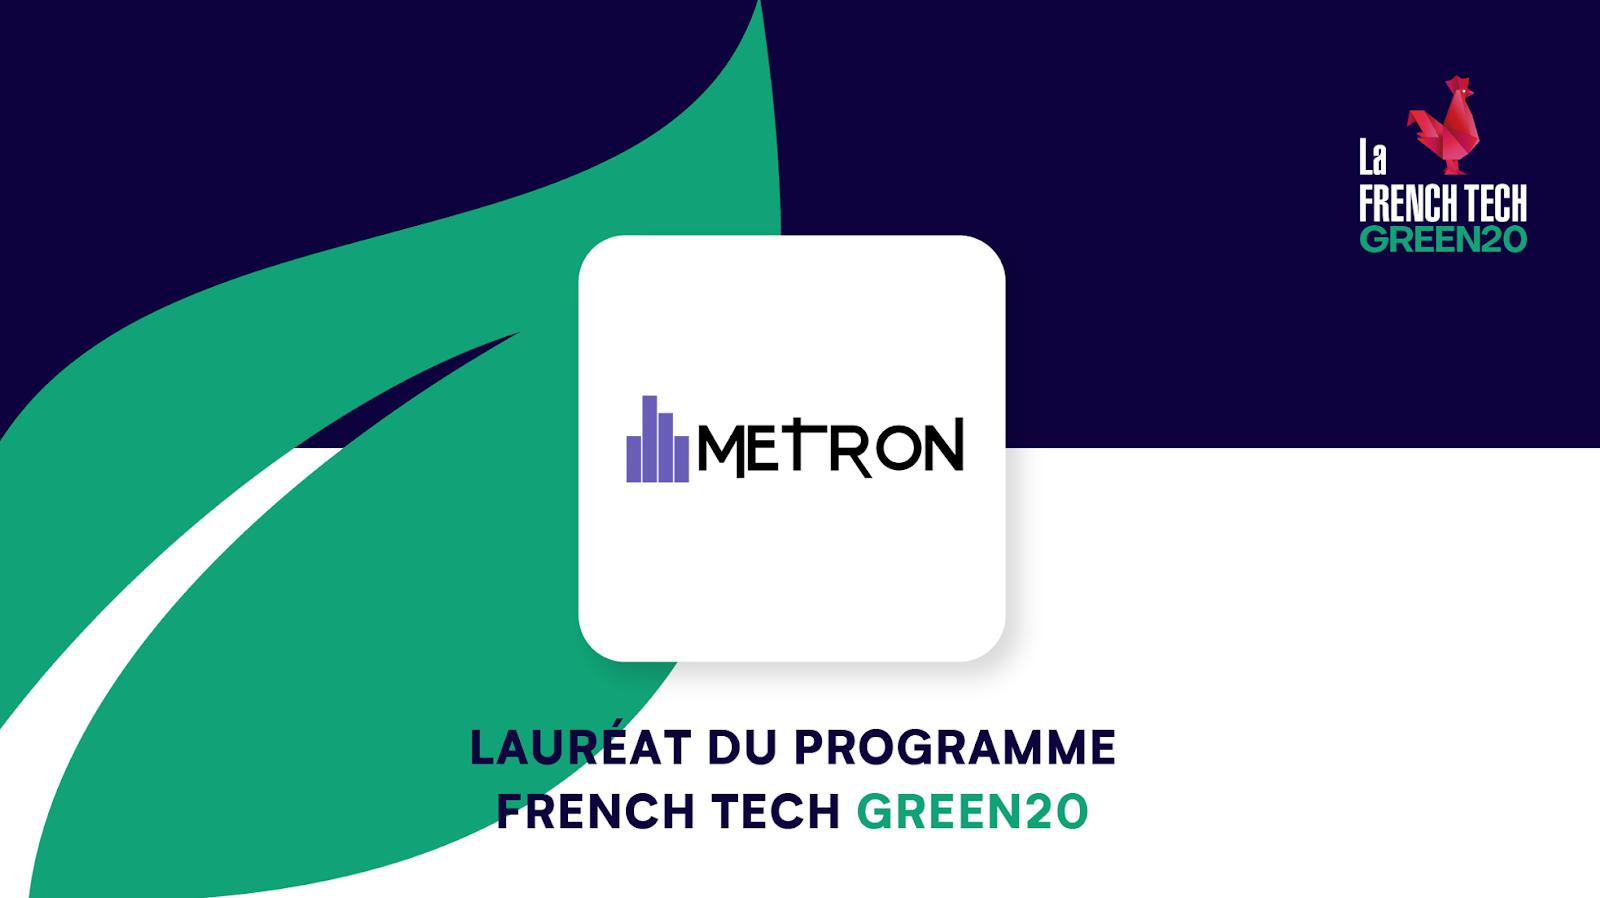 frenchtech-metron-green20